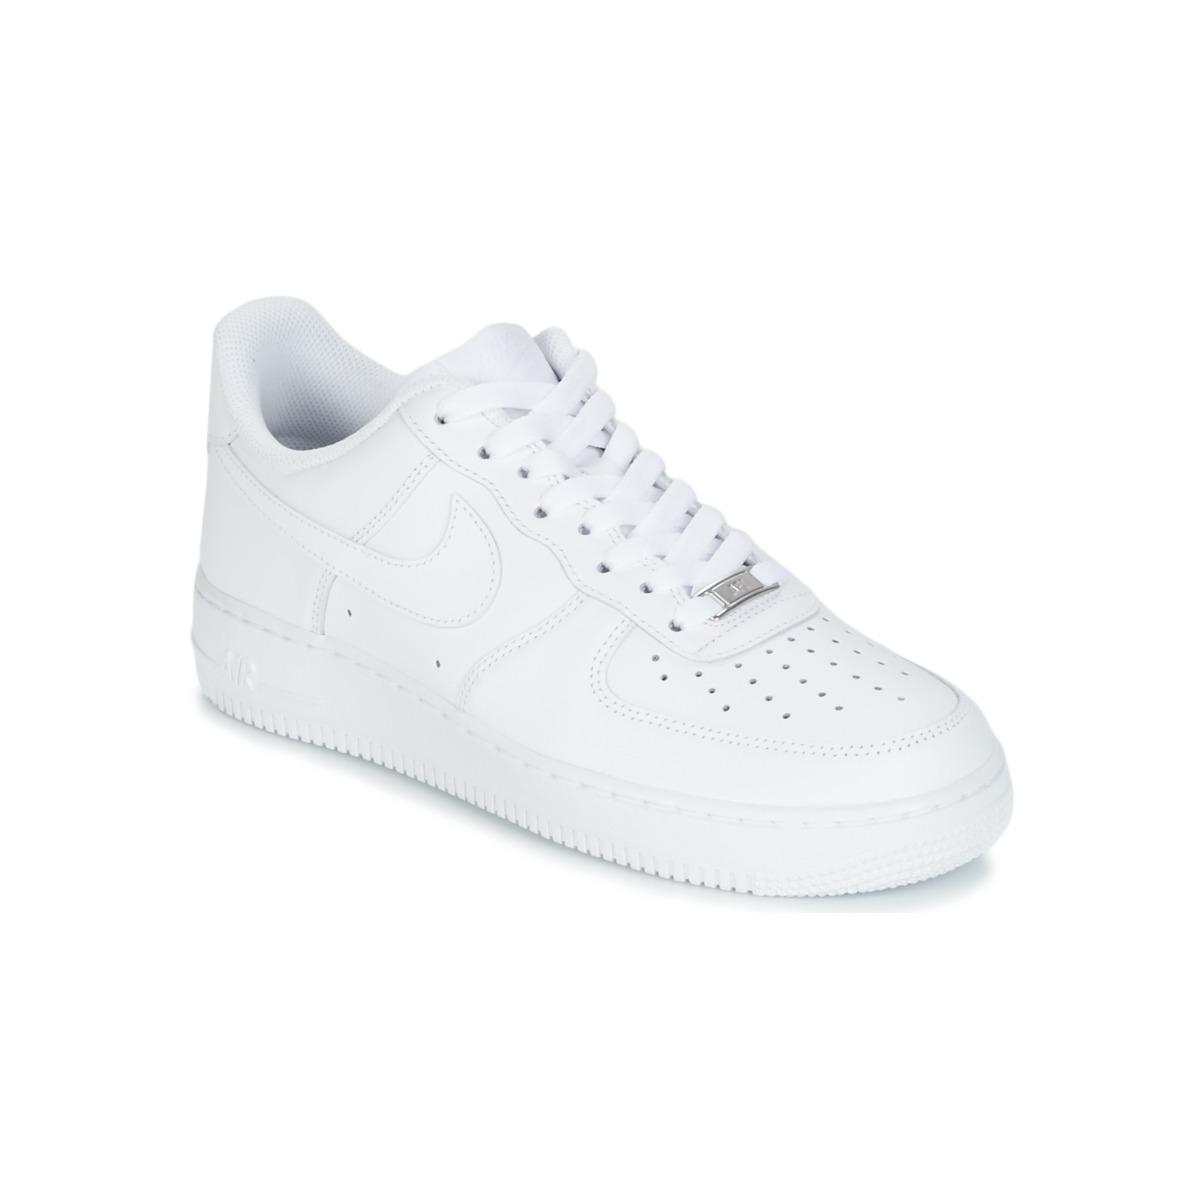 Herren Sneaker Low Nike Air max 1 Essential schwarz Schuhe